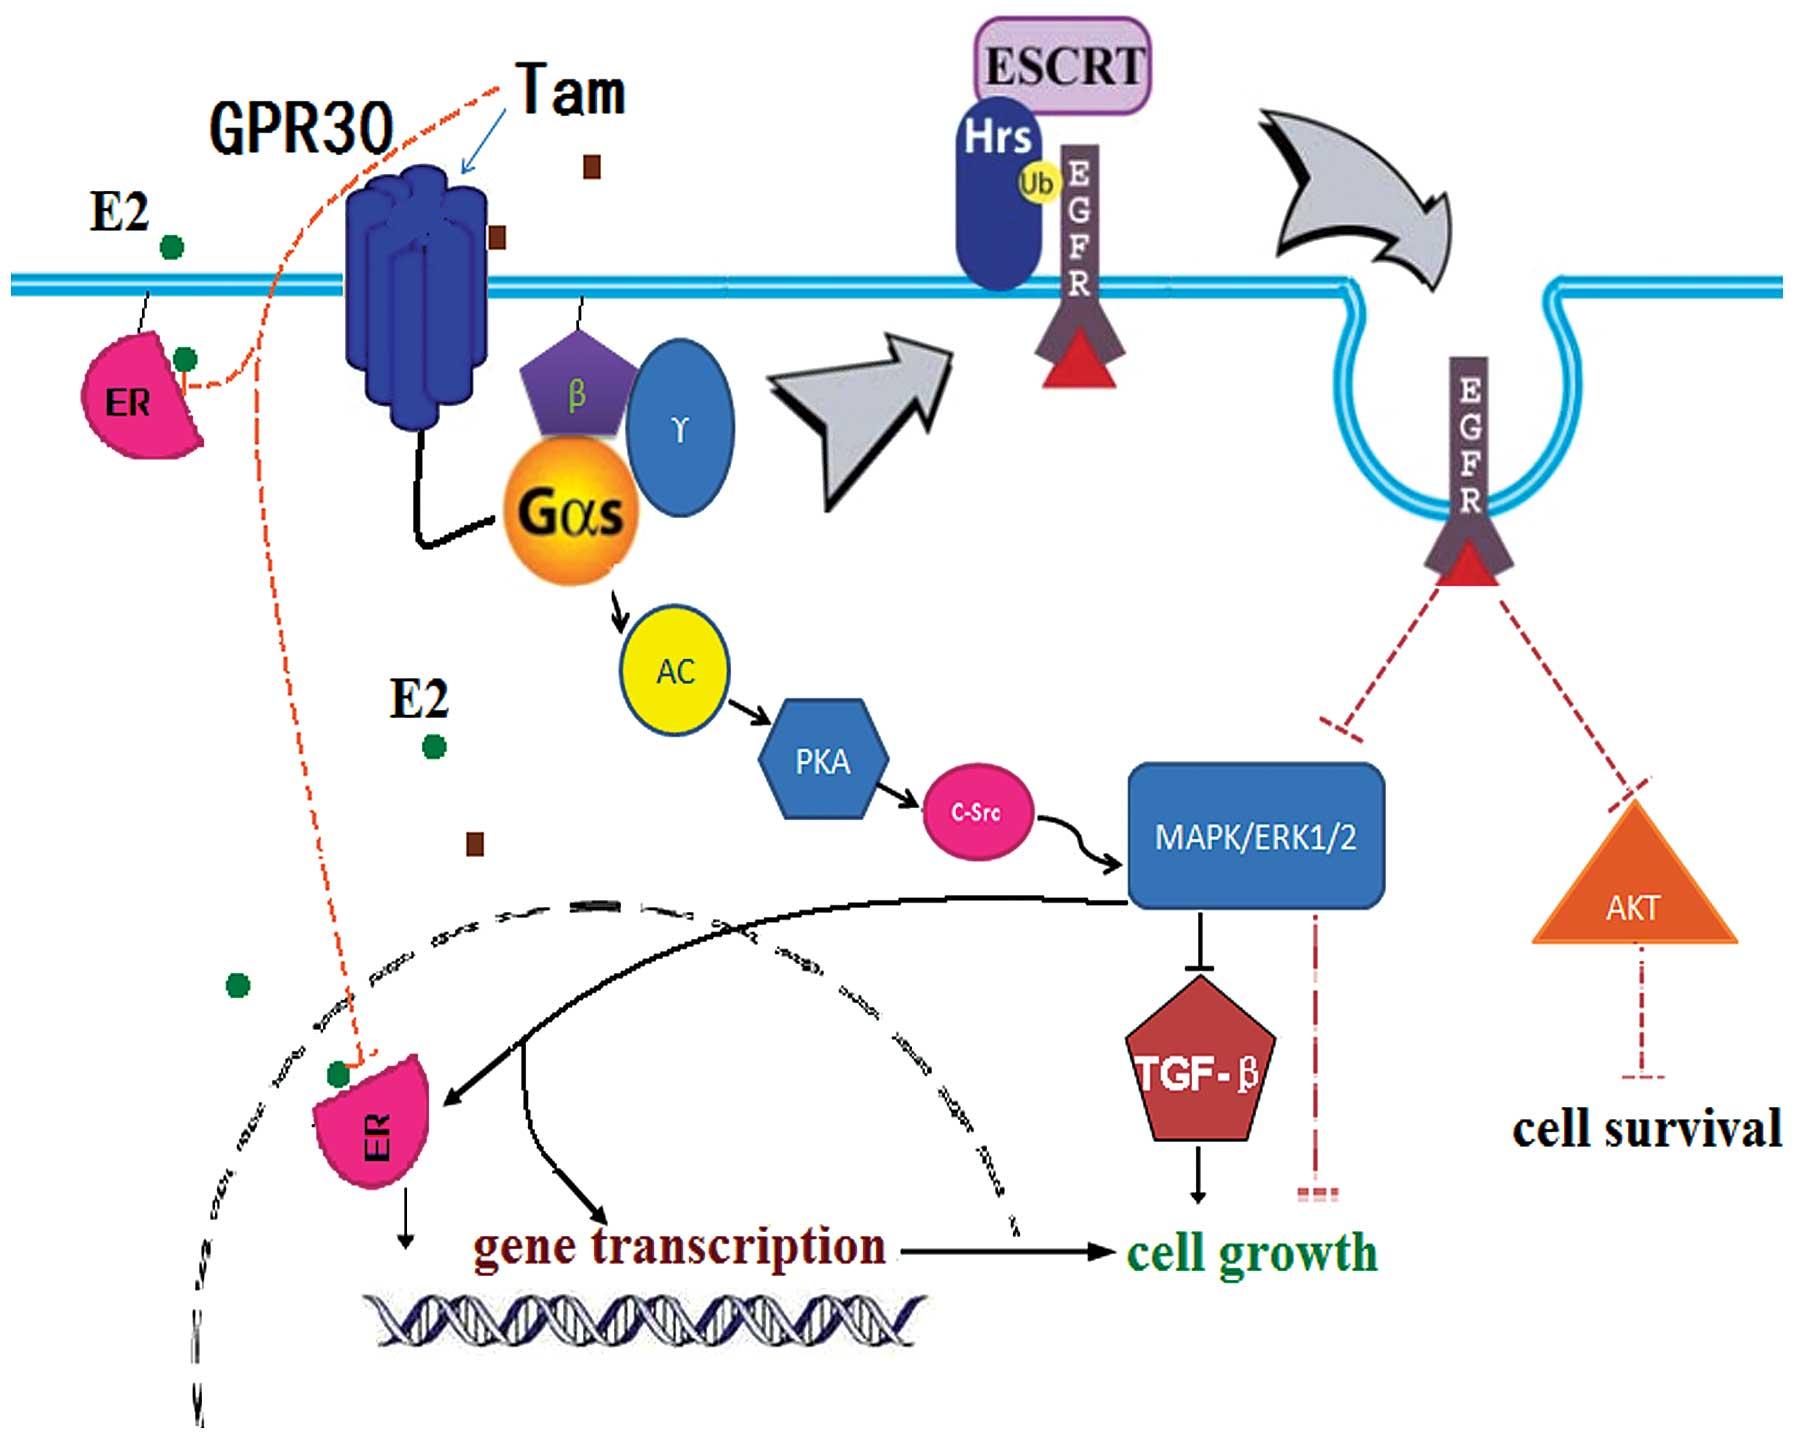 Tamoxifen resistance in breast cancer elucidating mechanisms of disease